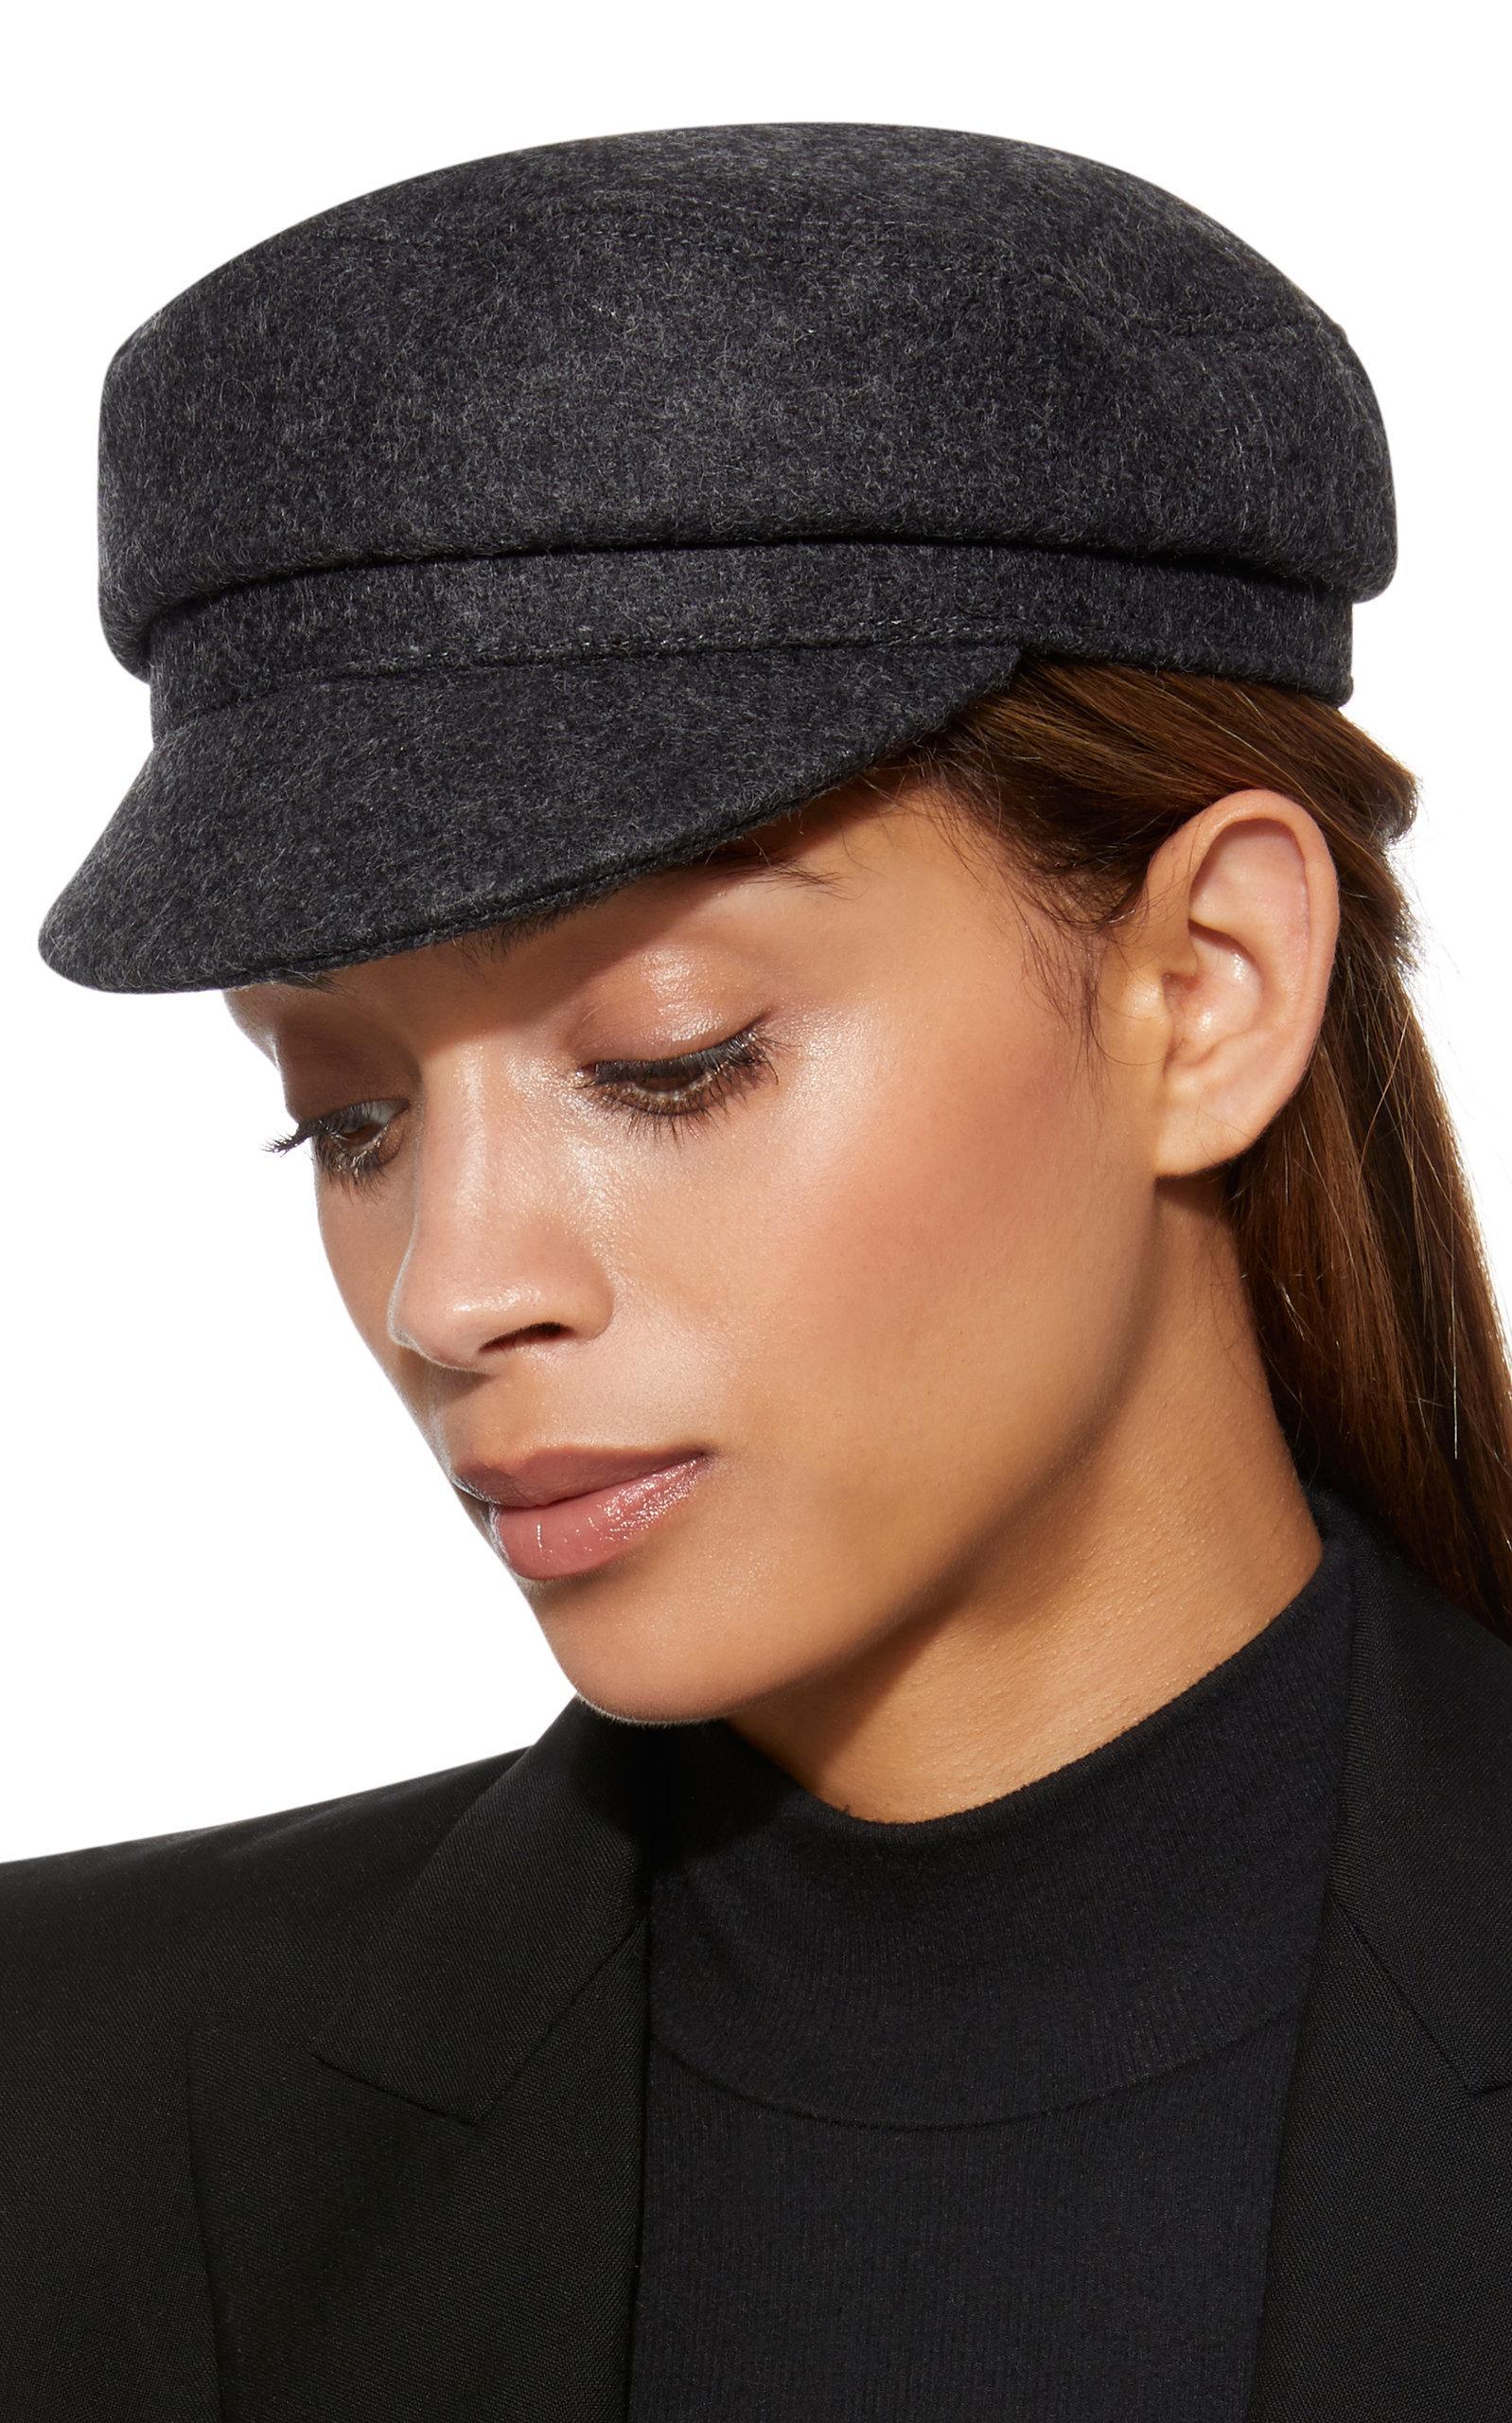 61d7ec93 Isabel Marant Evie Wool-felt Cap in Gray - Save 4% - Lyst